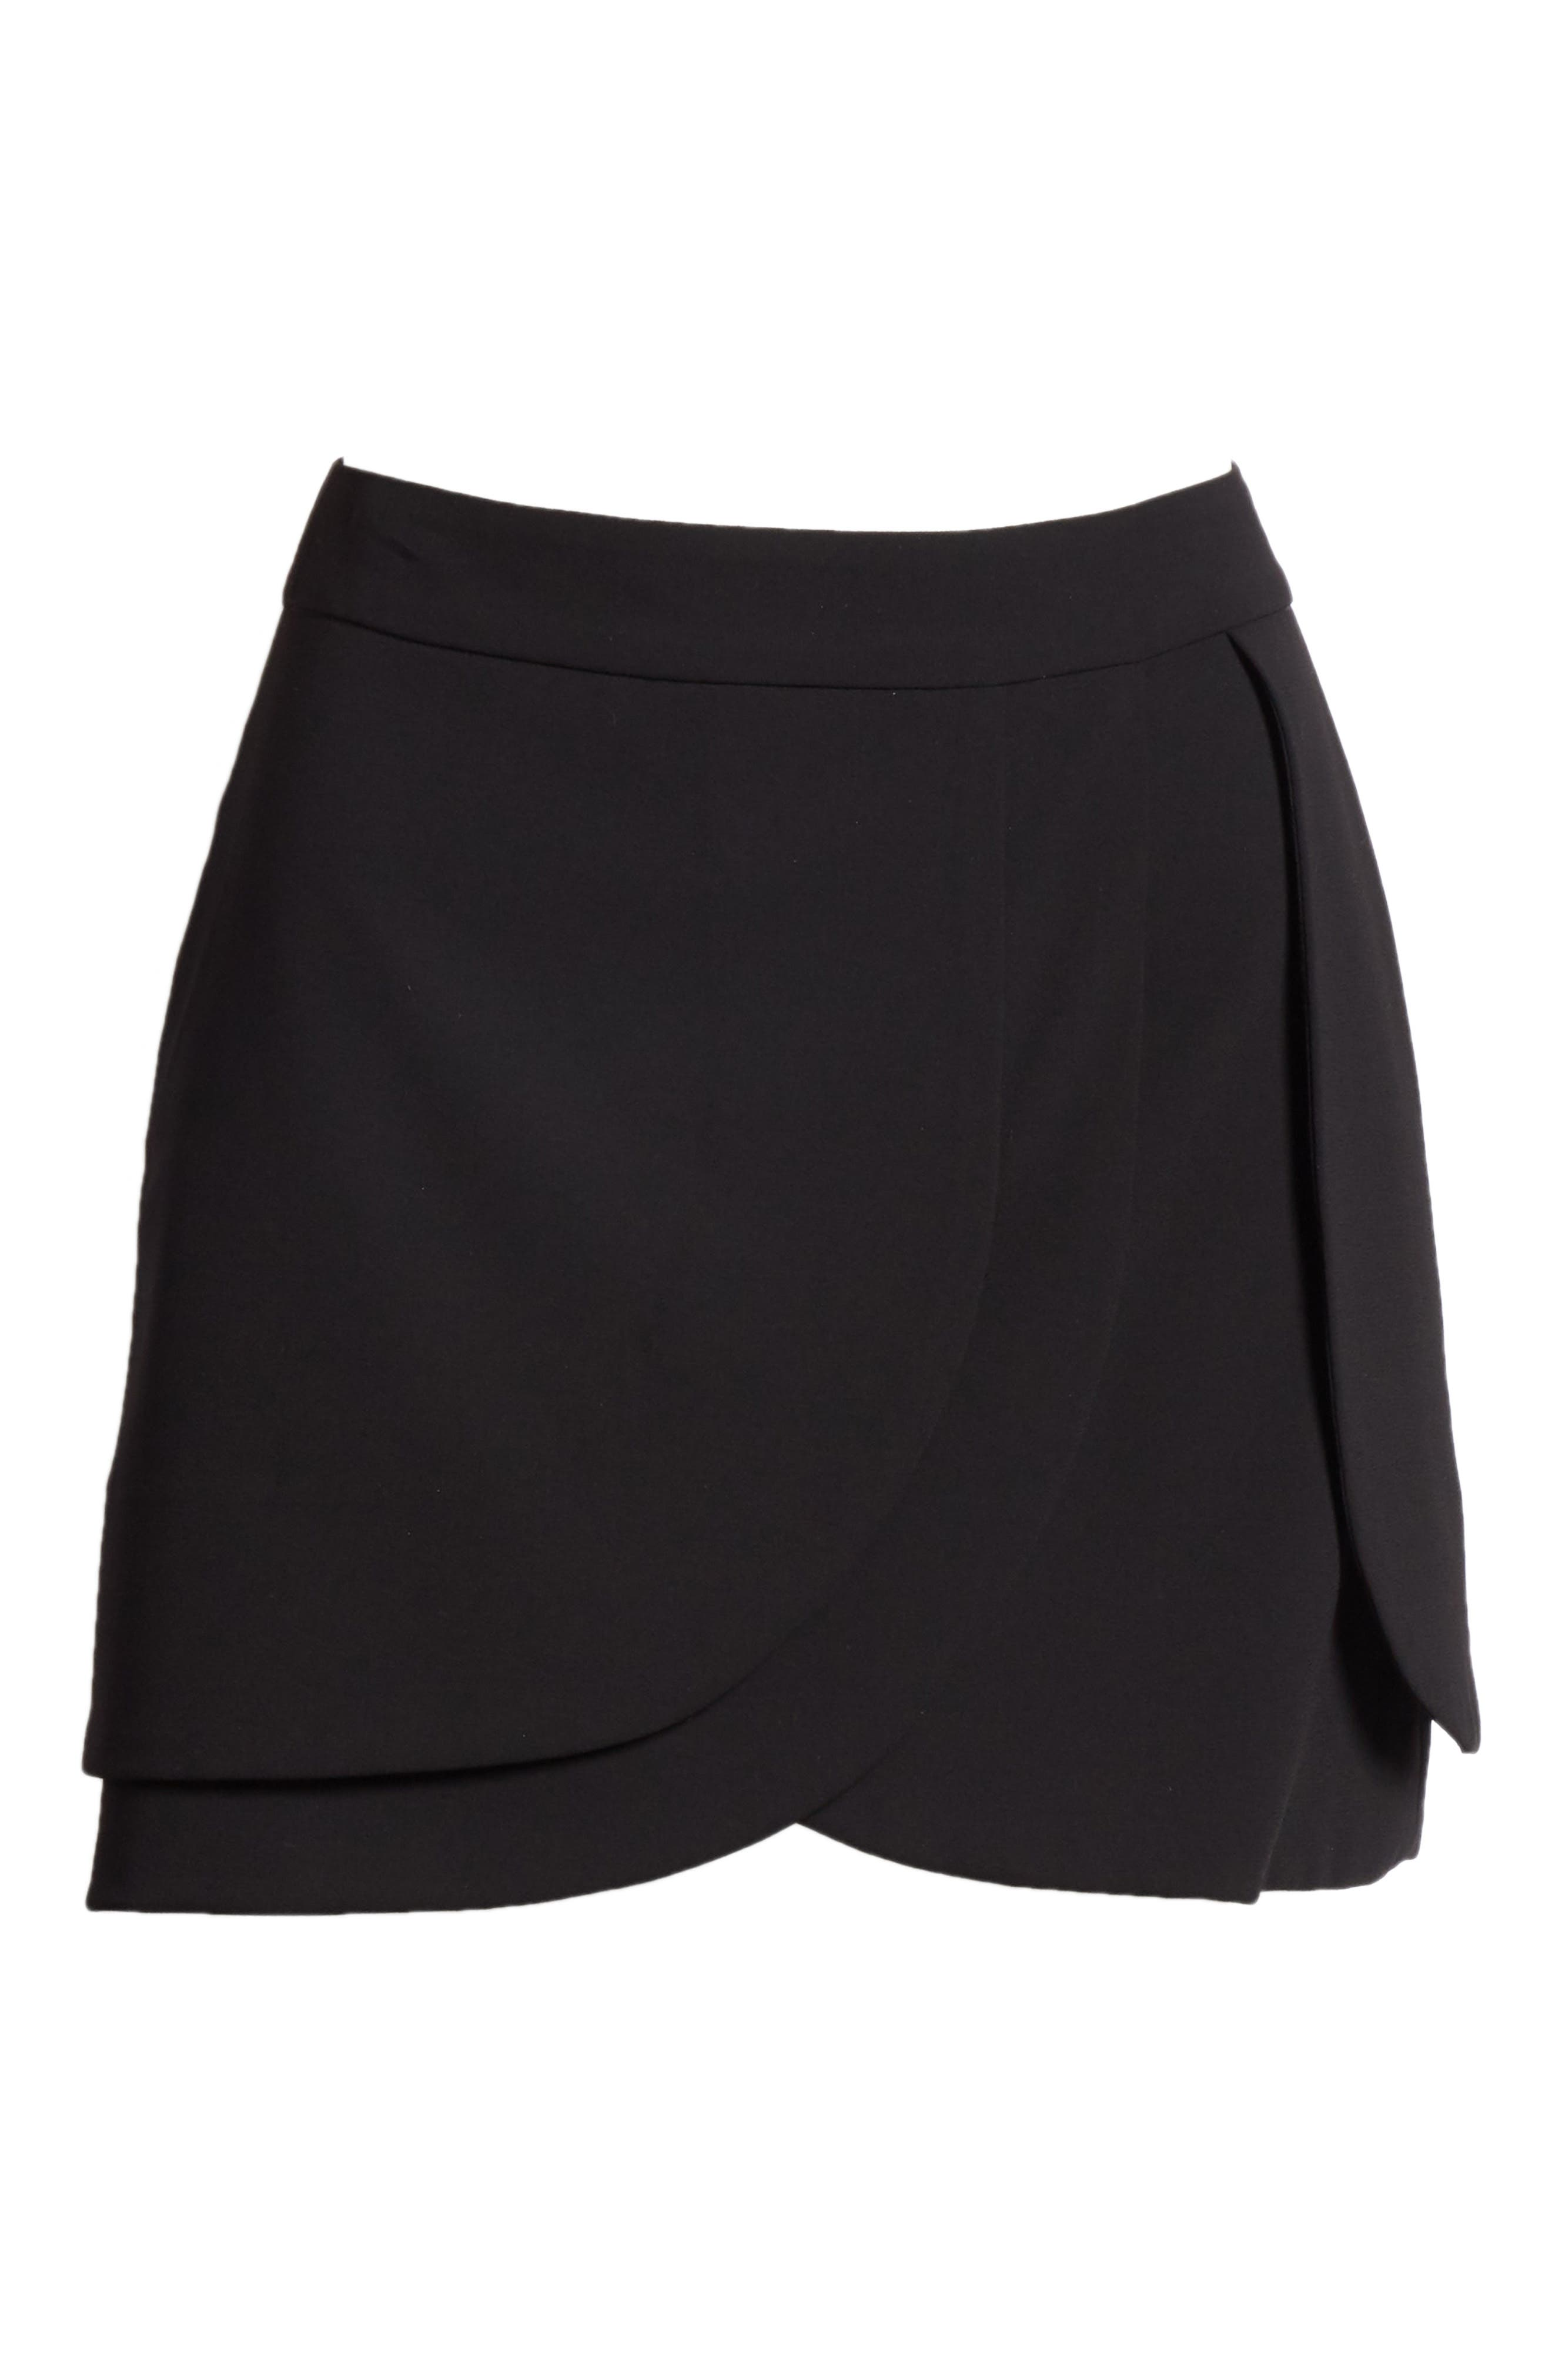 Nicolina Layered Tulip Miniskirt,                             Alternate thumbnail 6, color,                             001